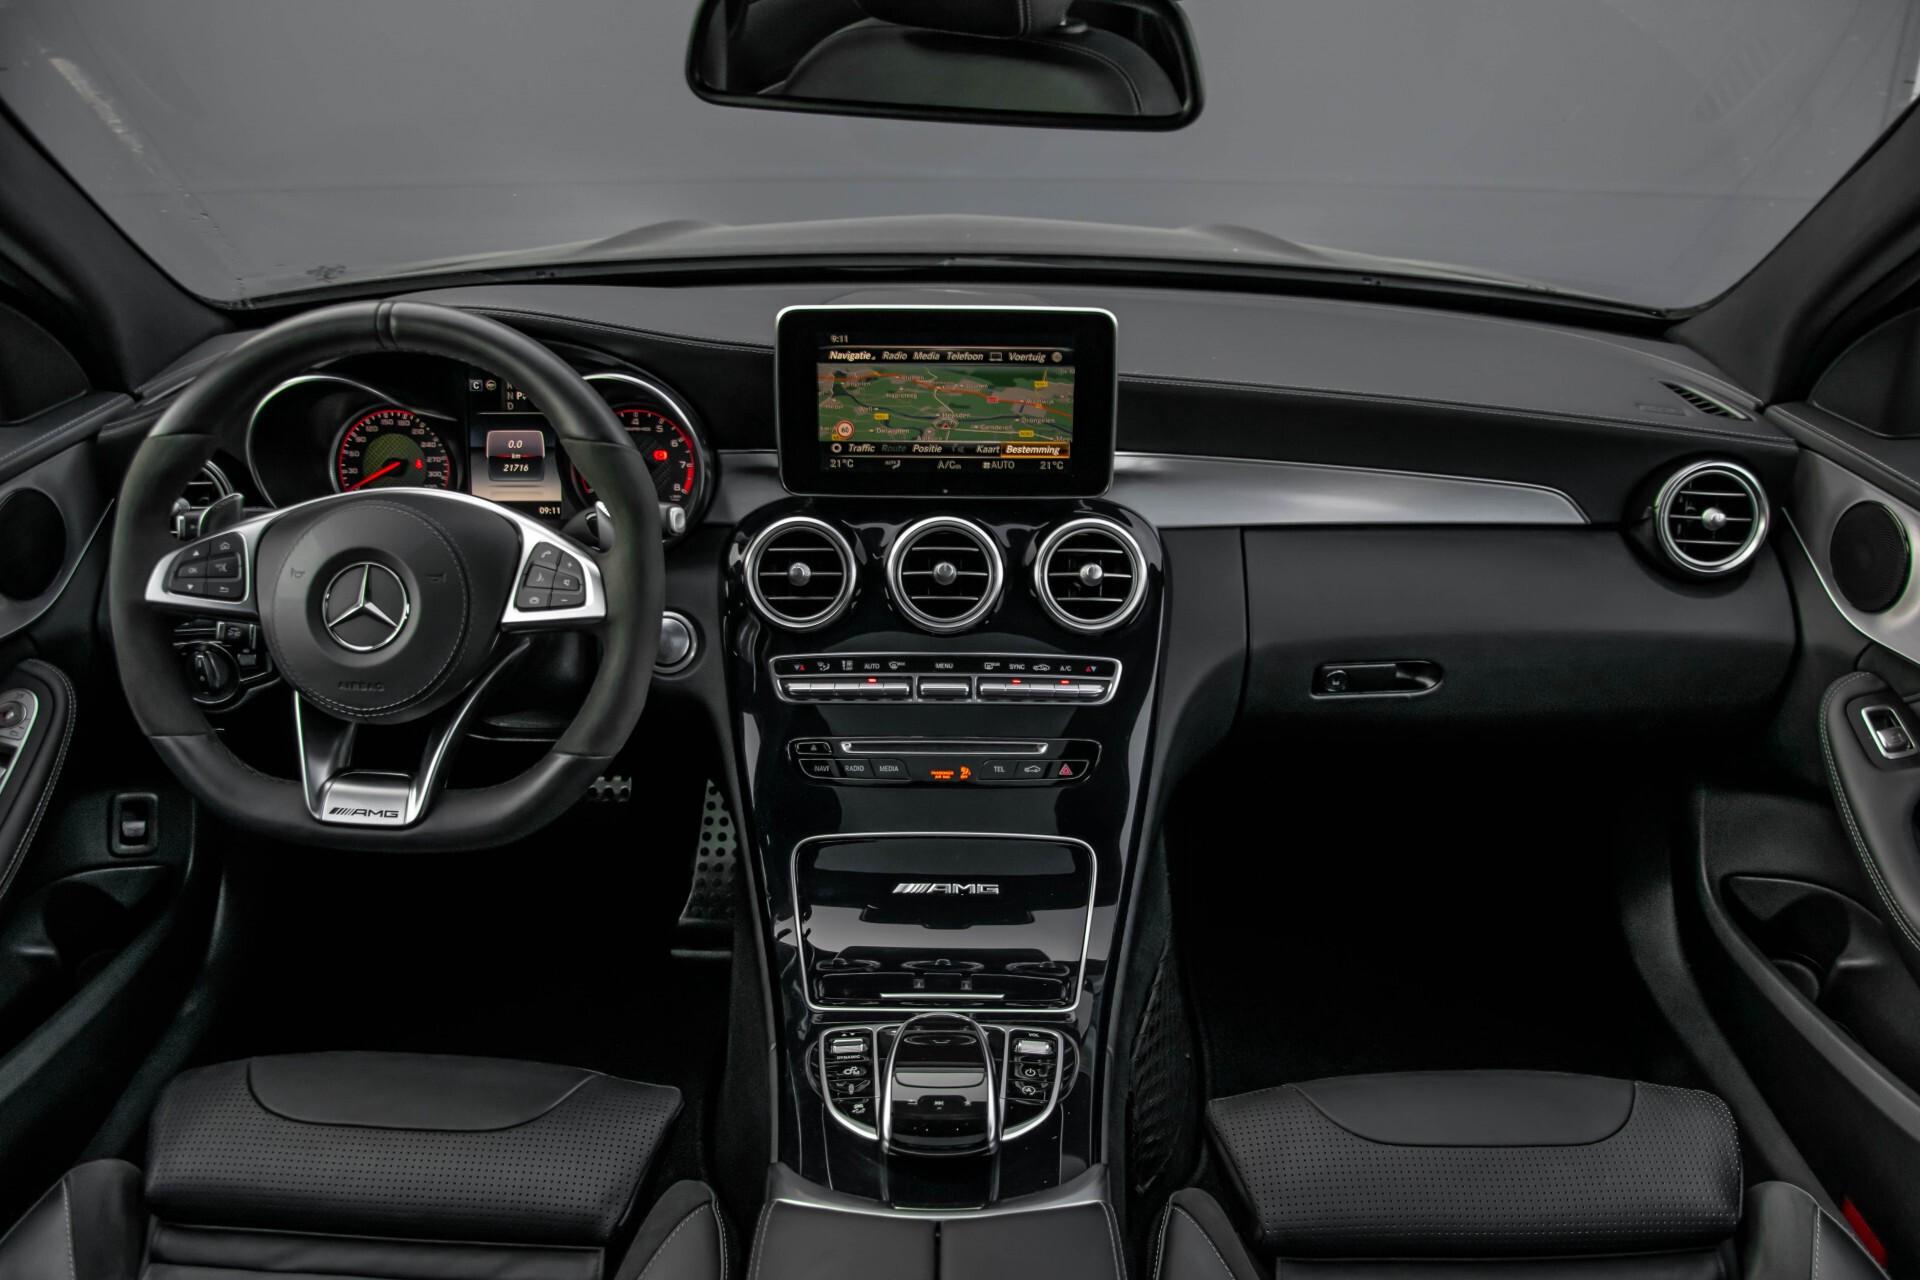 Mercedes-Benz C-Klasse 63 AMG S Panorama/Distronic/Keyless/Comand/Camera/ILS Aut7 Foto 6